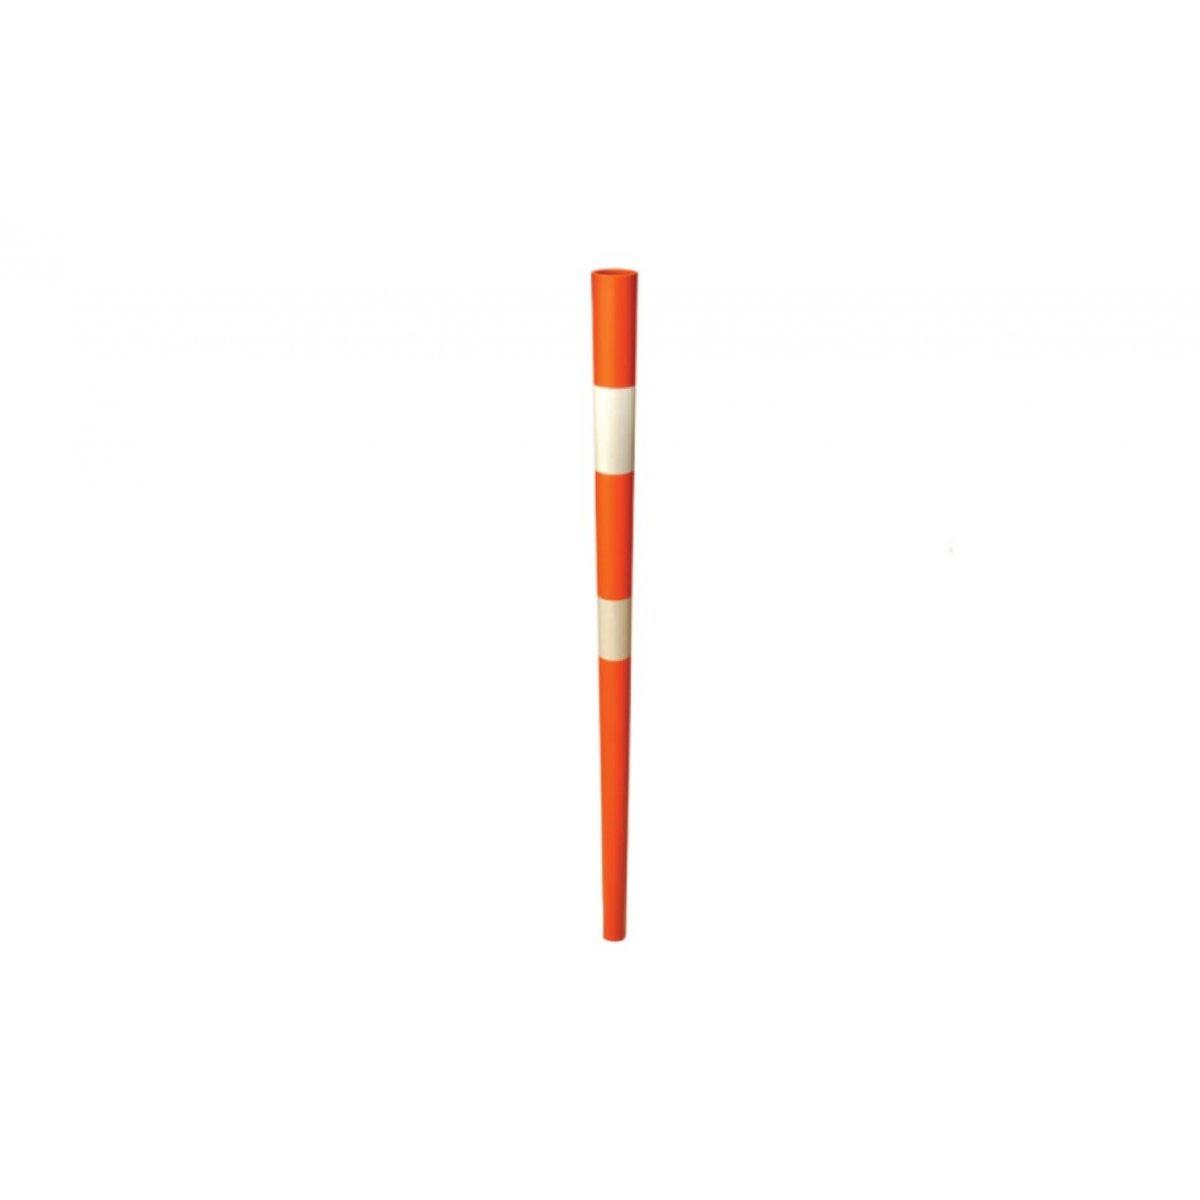 Веха пластиковая ВО-1 d=40мм, h=1500мм